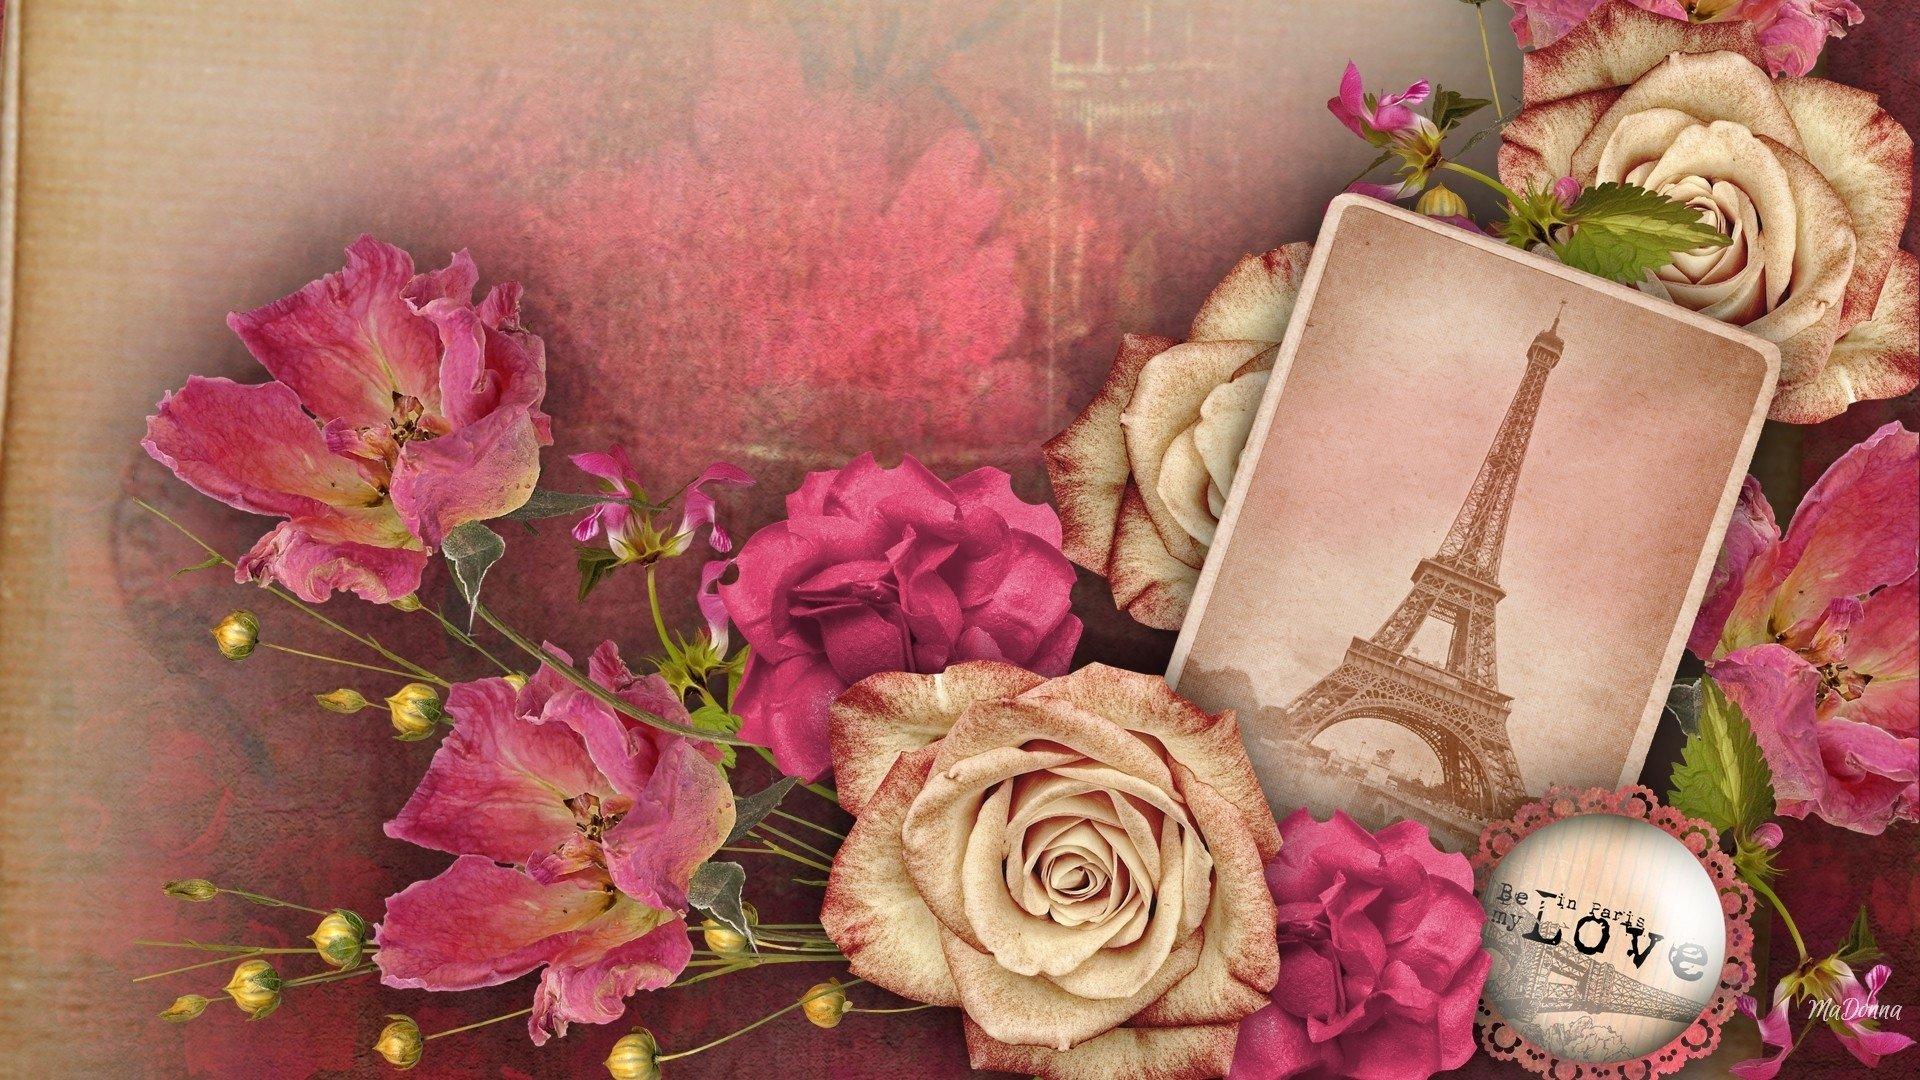 Chic Wallpaper For Iphone Memories Of Paris Fondo De Pantalla Hd Fondo De